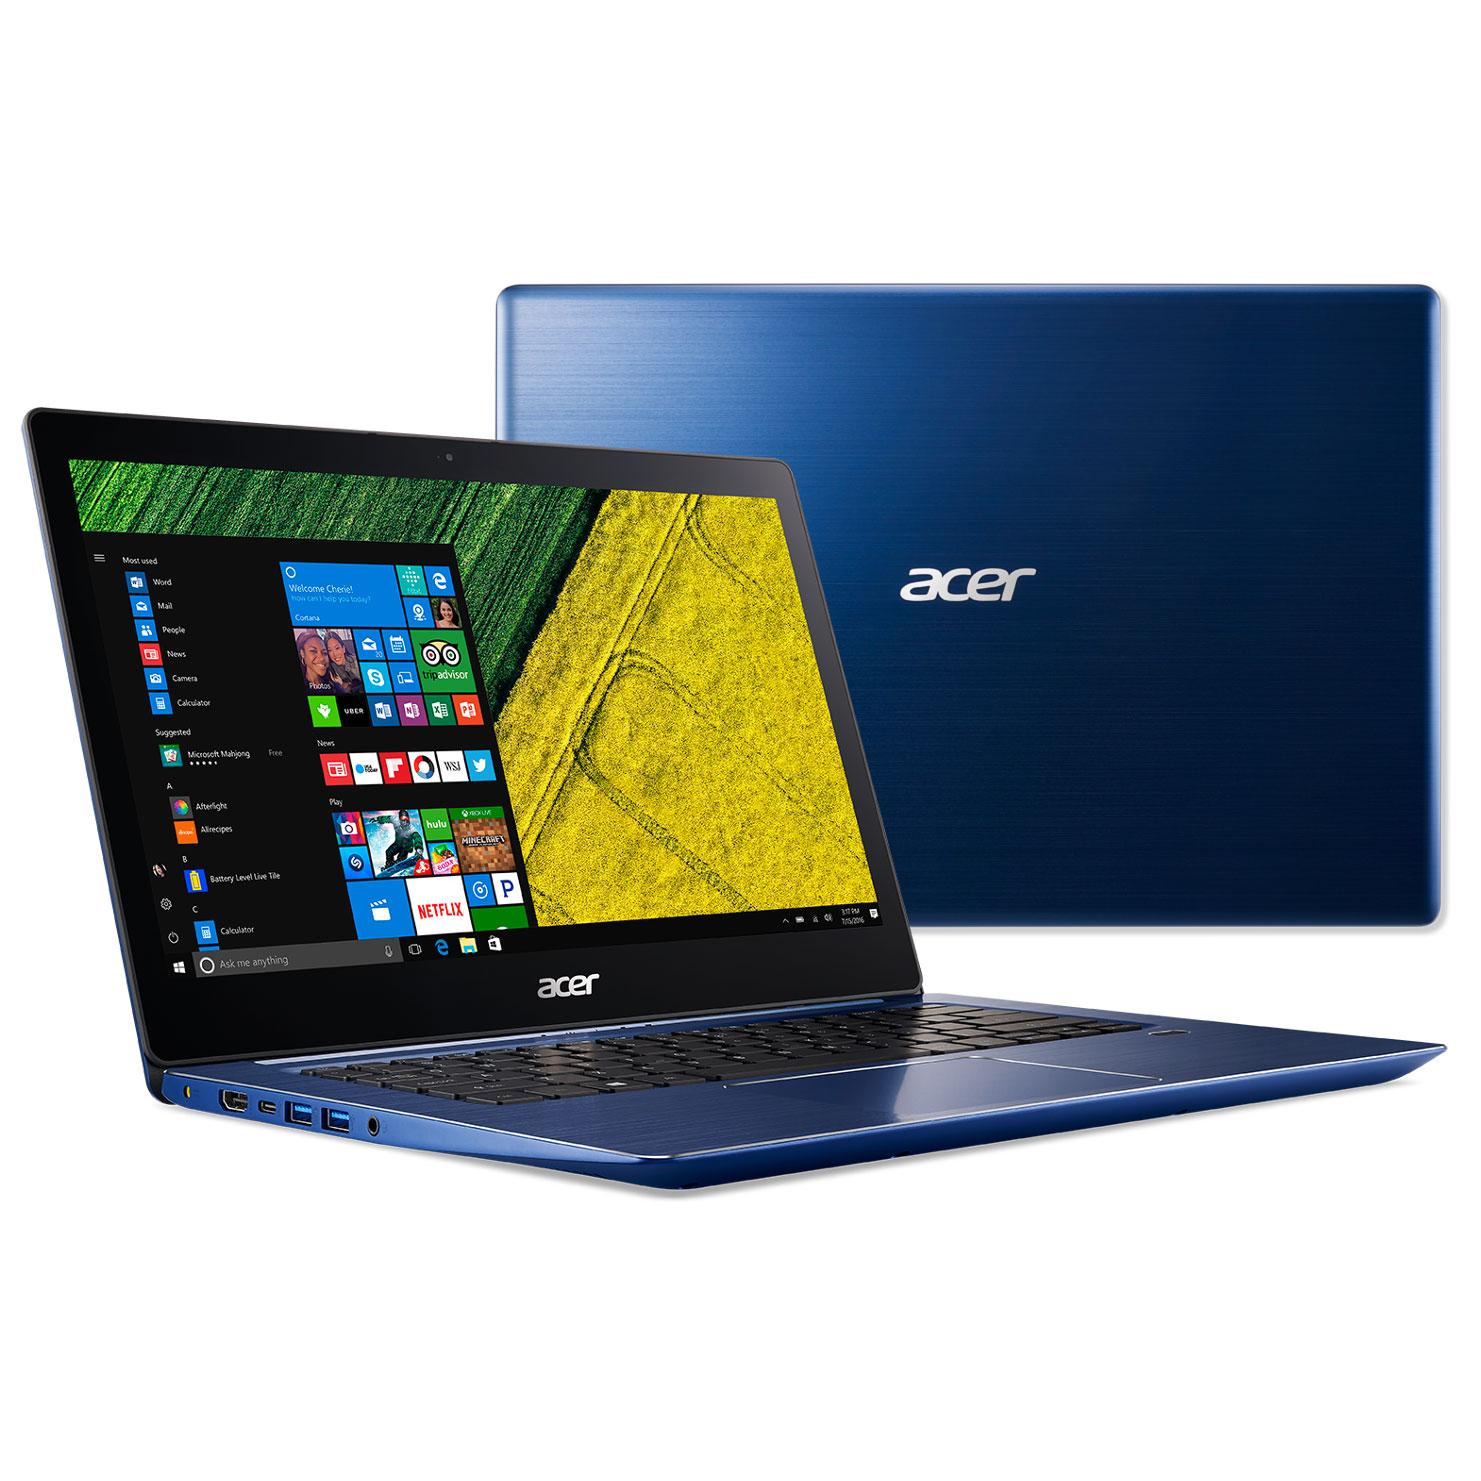 Acer Swift 3 SF314 52 54LU Bleu Intel Core I5 7200U 4 Go SSD 256 14 LED Full HD Wi Fi AC Bluetooth Webcam Windows 10 Famille 64 Bits